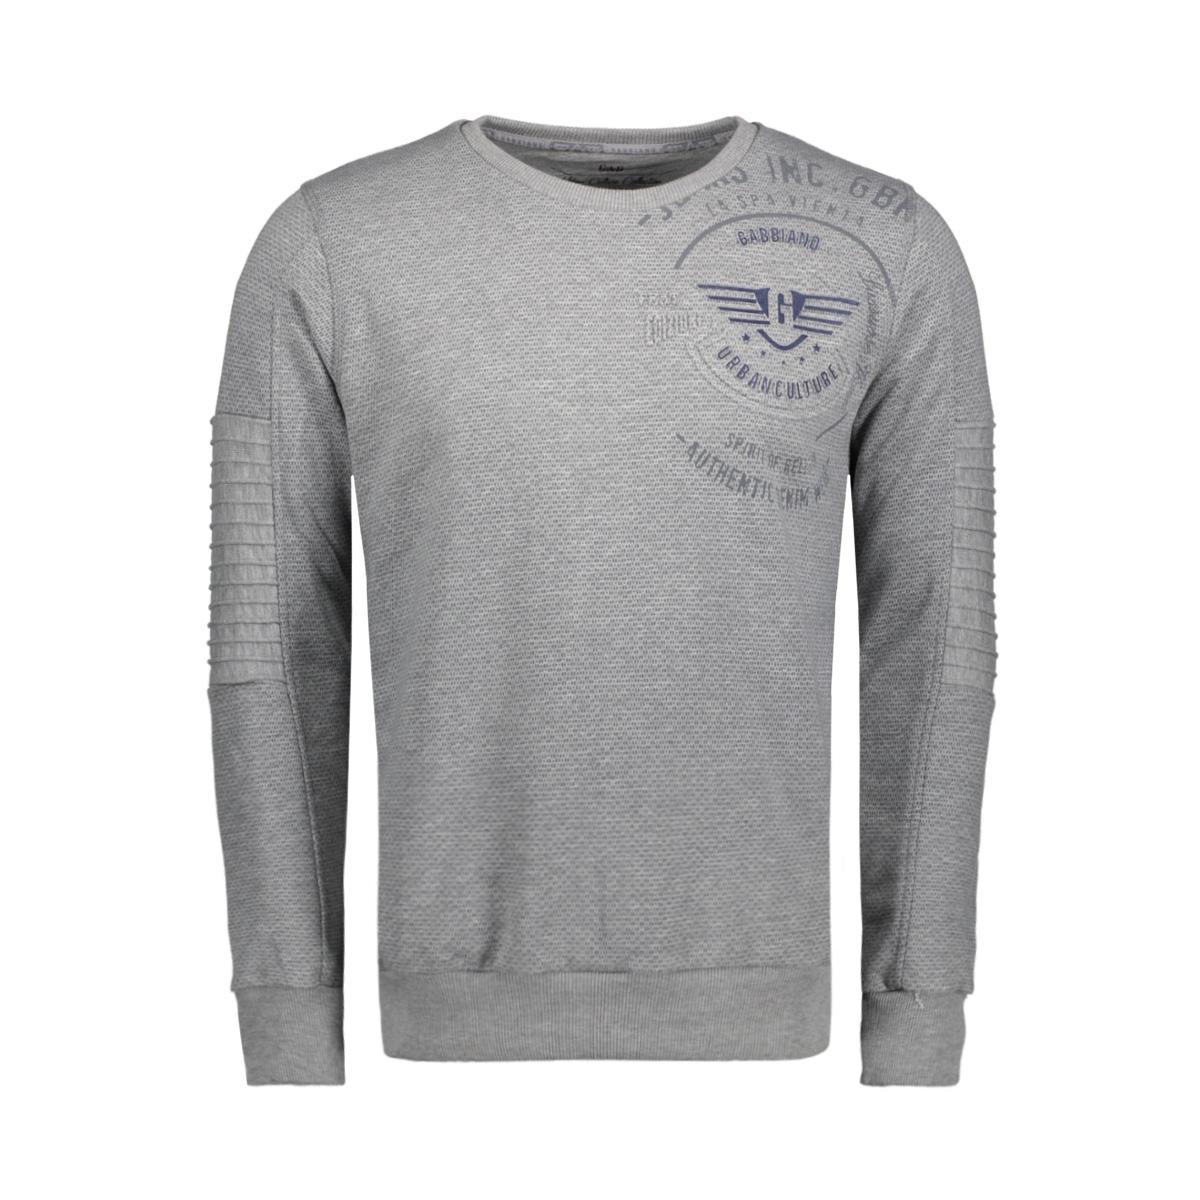 76125 gabbiano sweater grey